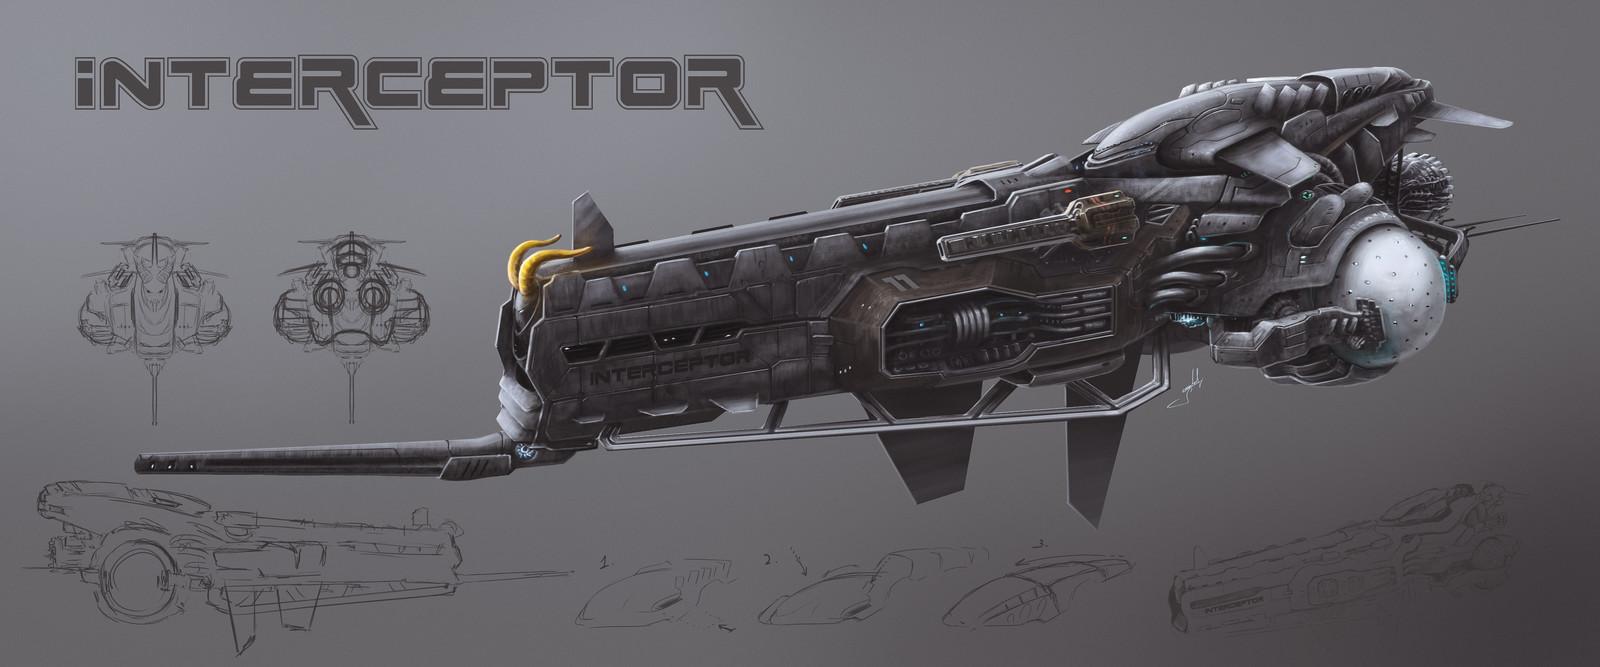 """Interceptor"" spacecraft"